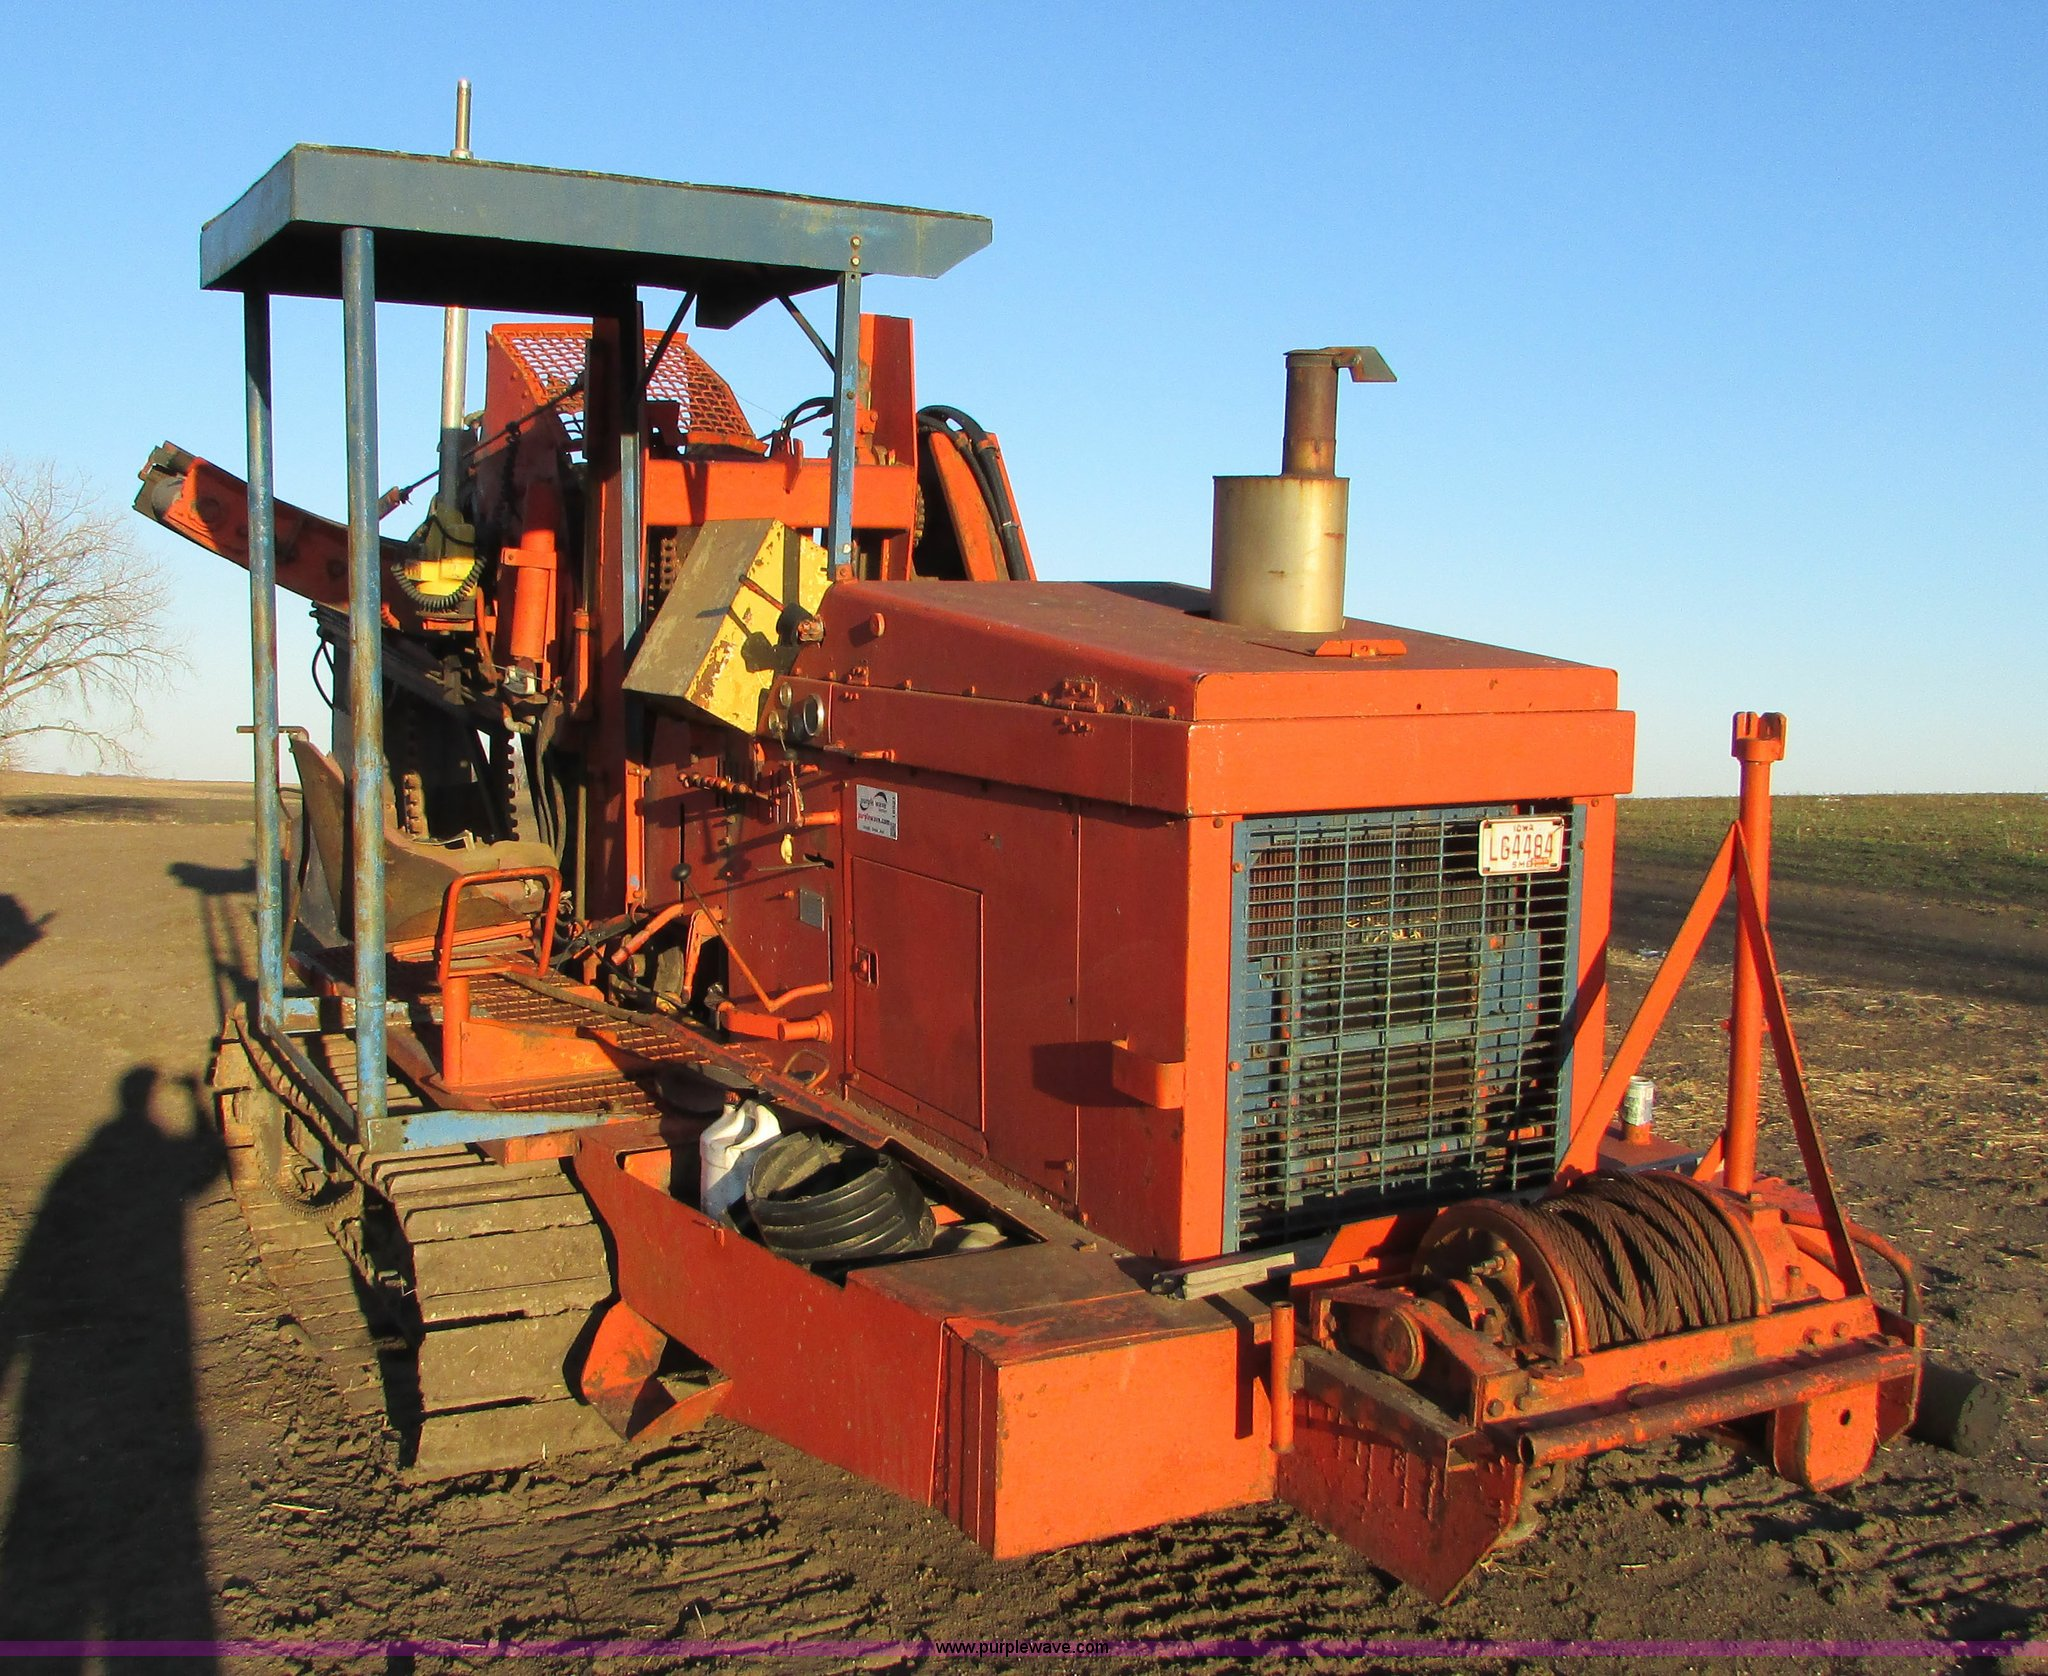 Koehring 600 drainage tile wheel trencher | Item I6521 | SOL